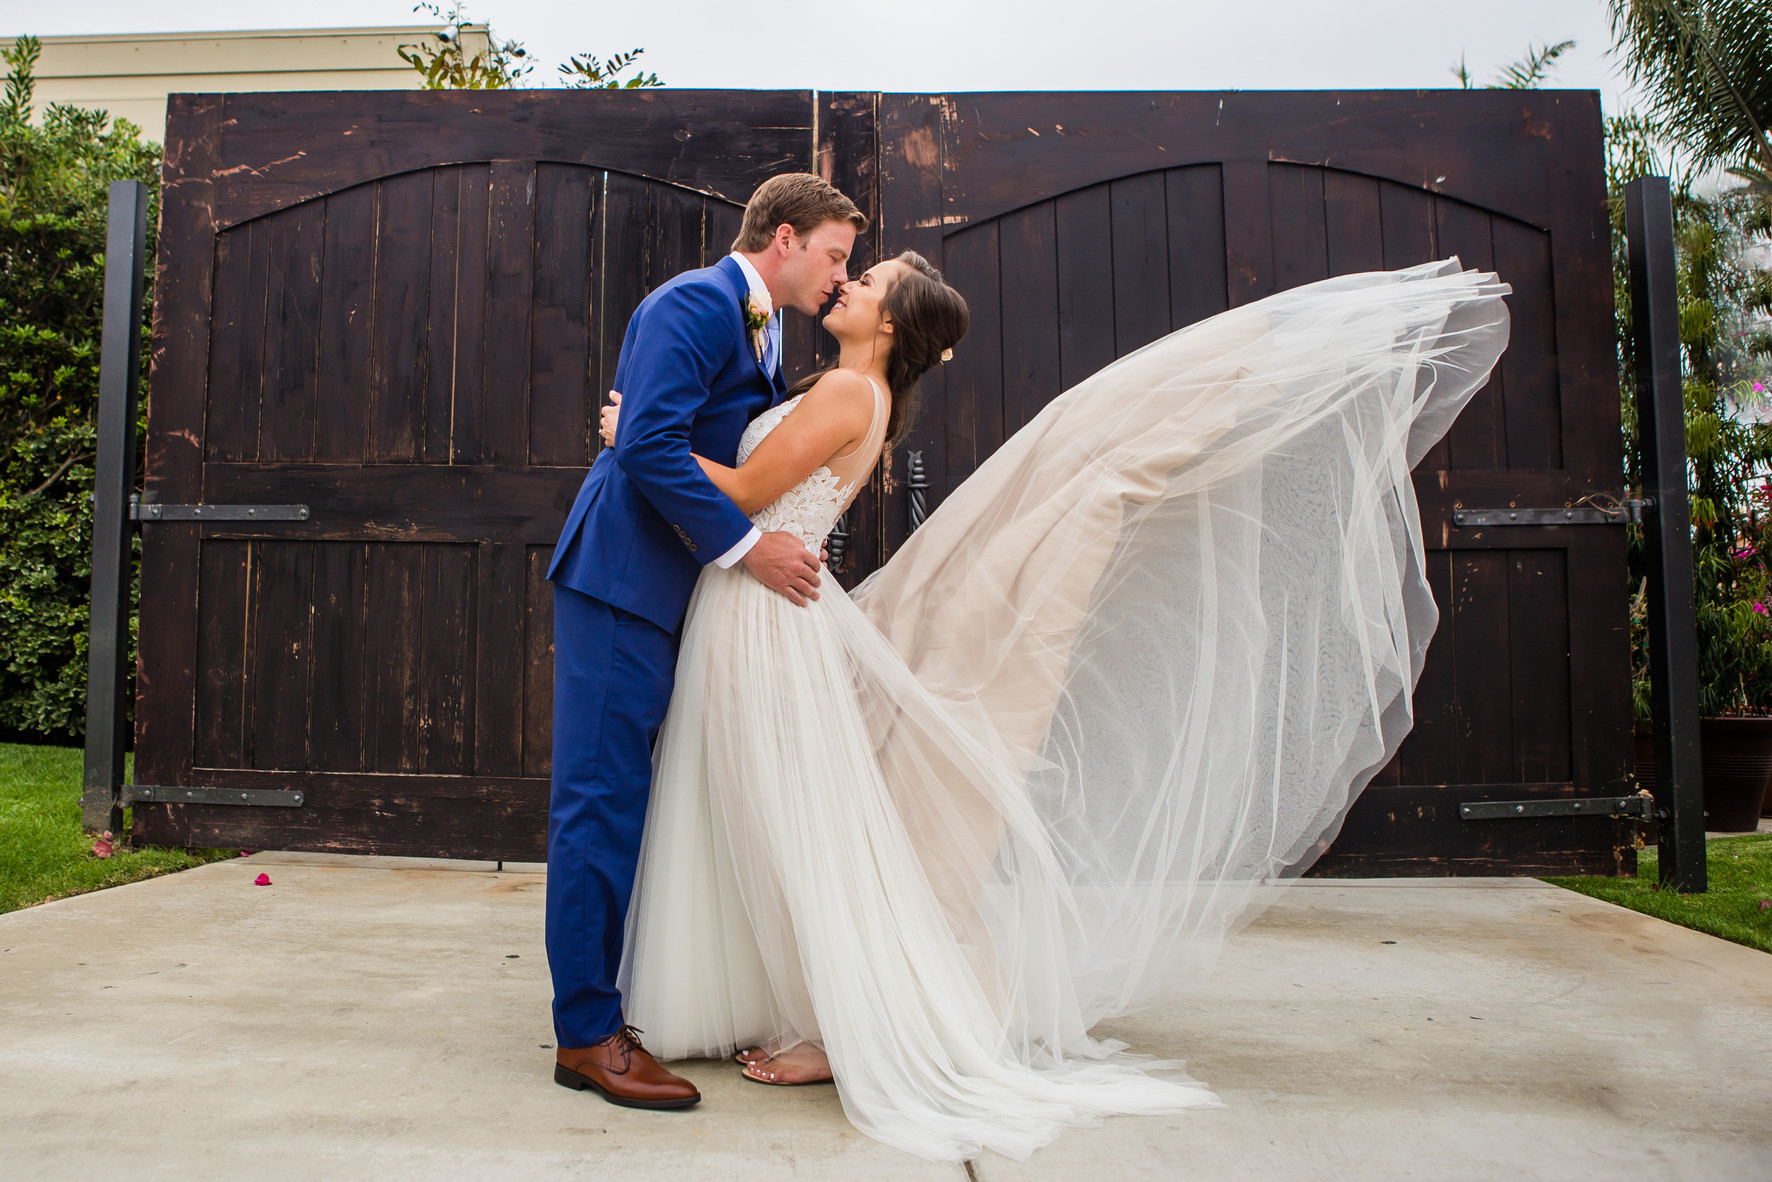 Best of wedding photography 2018, Berlynn Photography, San Diego Wedding Photography, Bride and Groom kiss